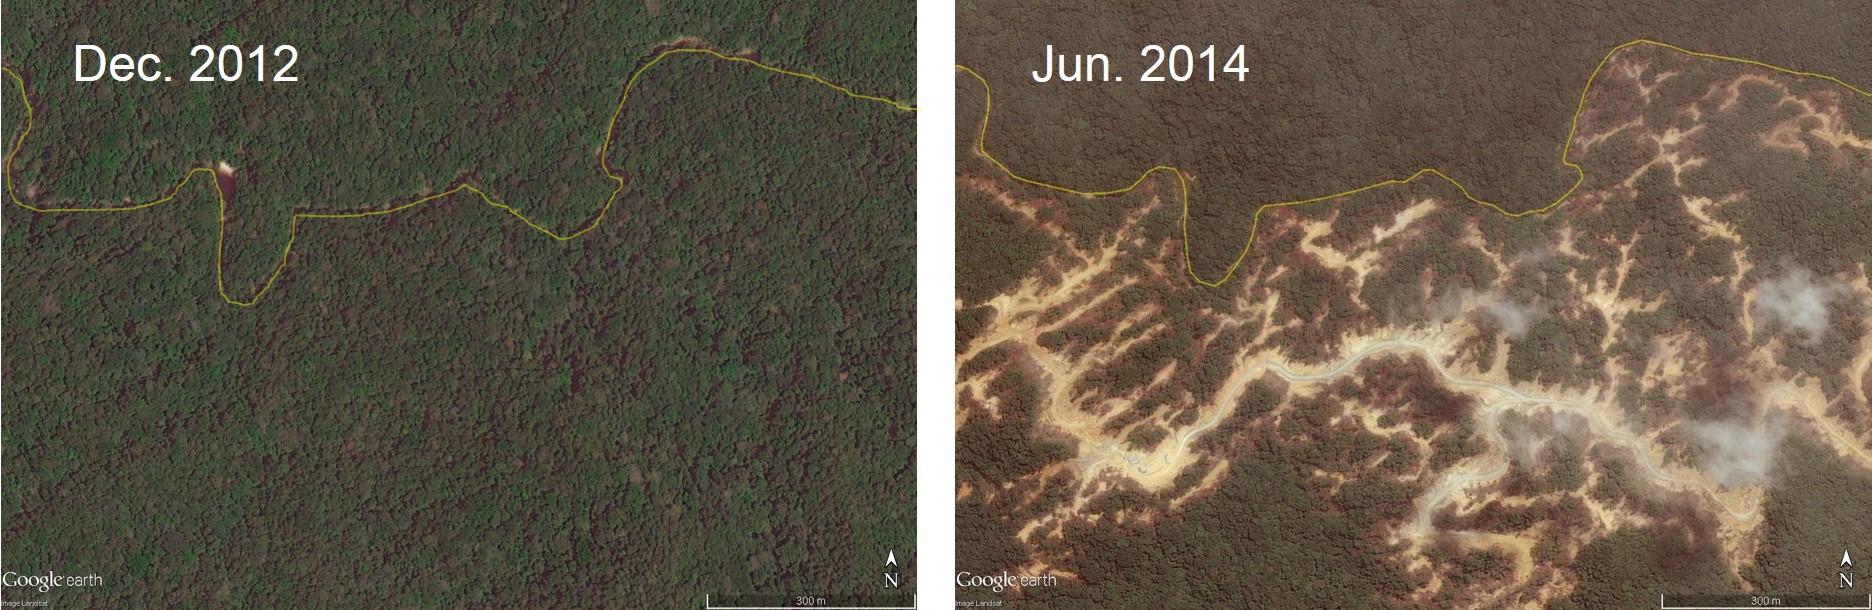 Satellite images of deforestation in Shin Yan T/3342 concession. Sarawak logging